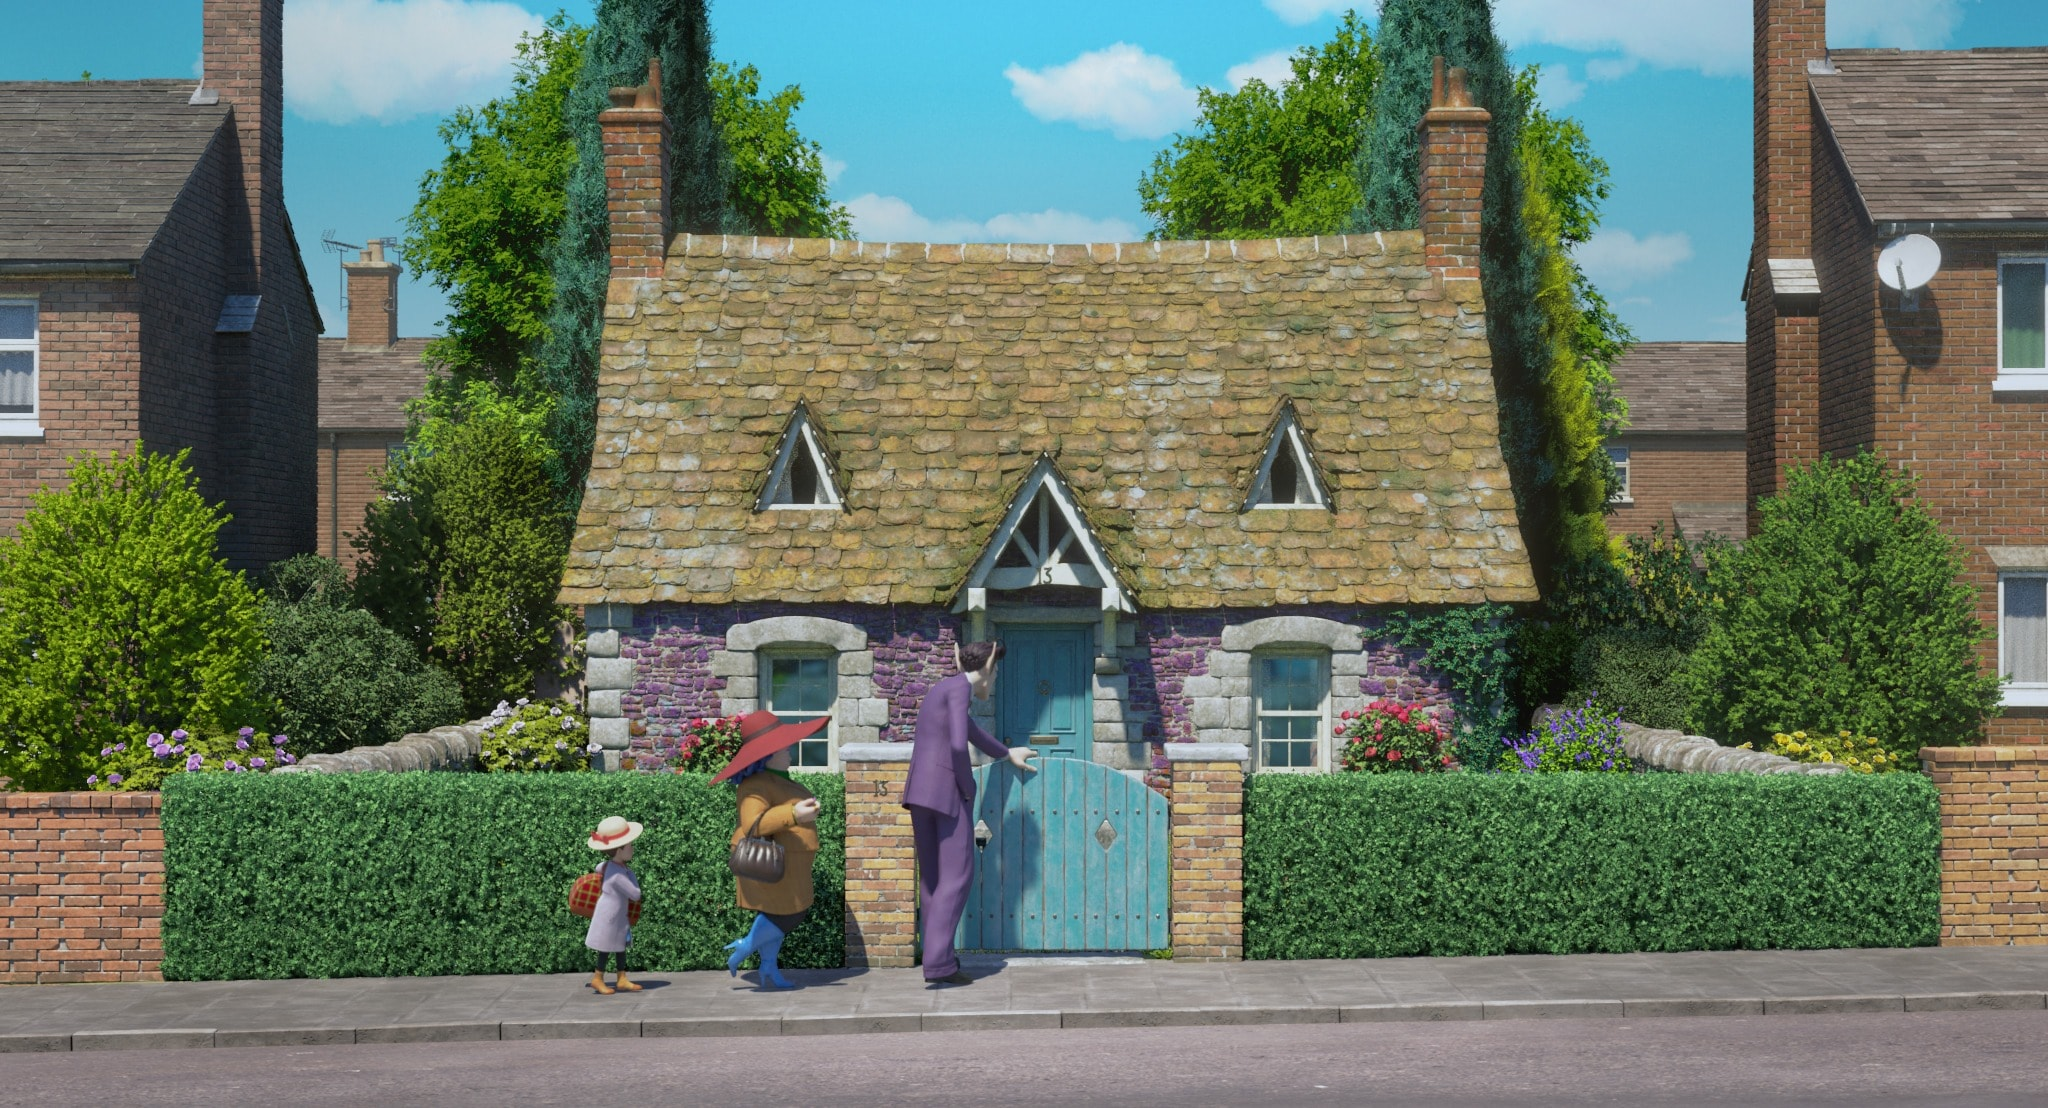 Earwig and the Witch, Studio Ghibli